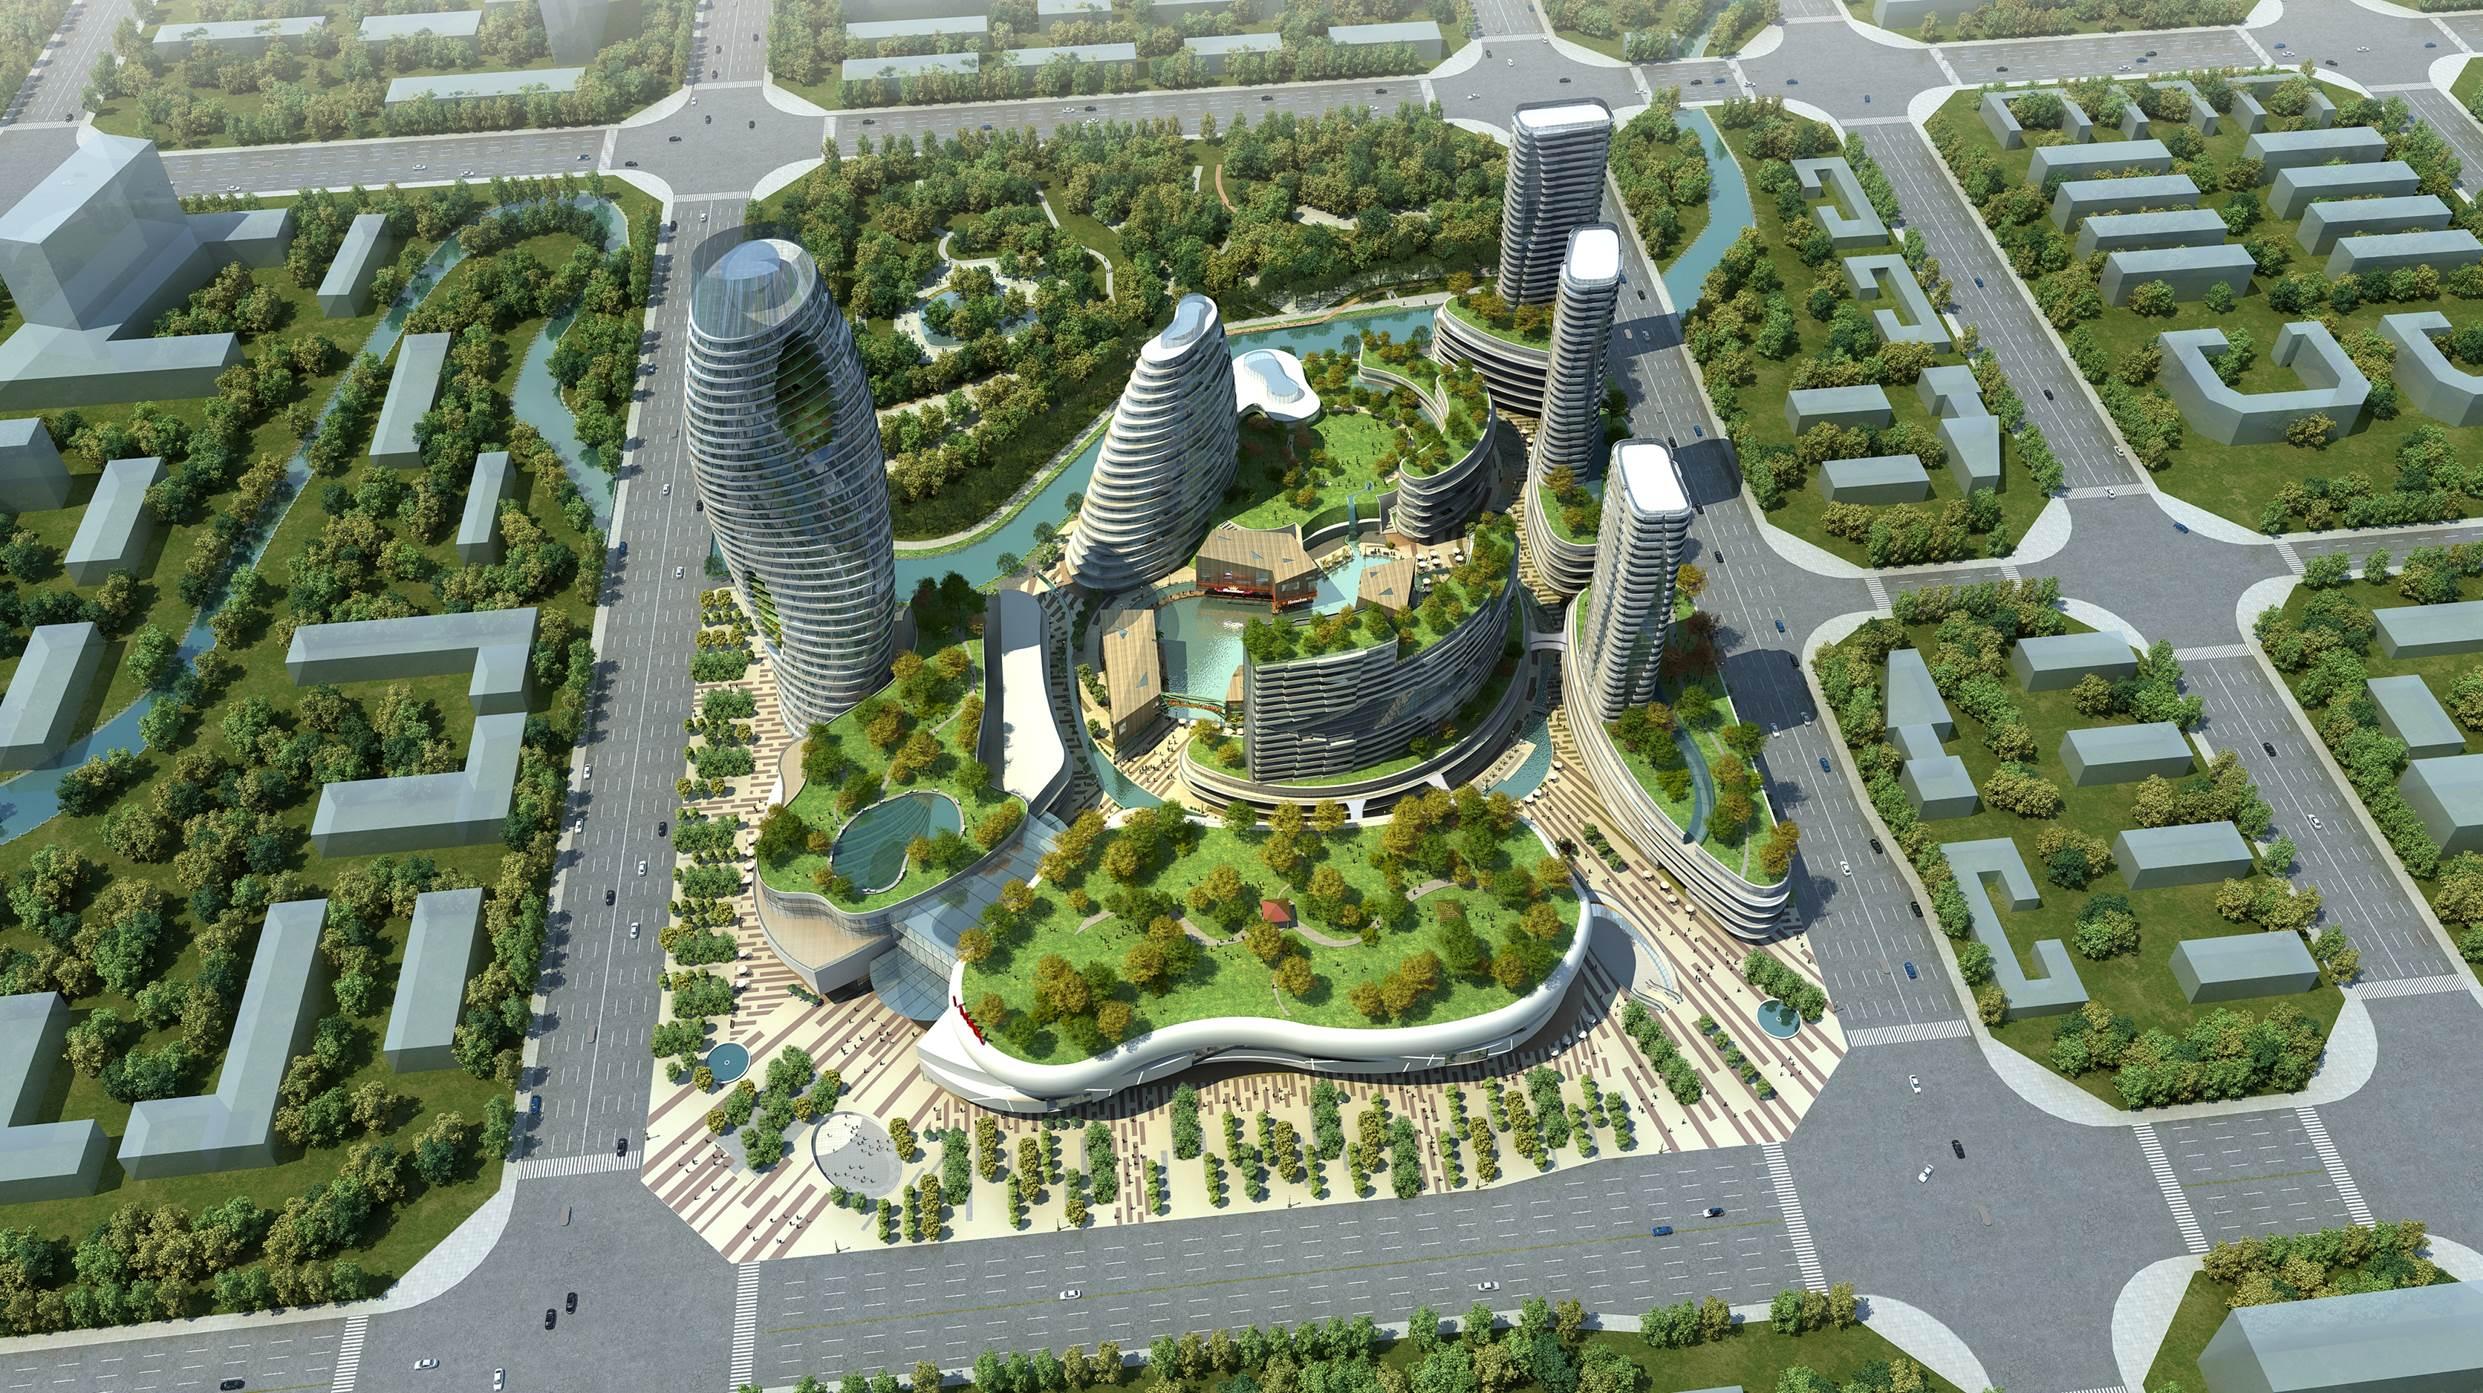 charles_tang_design_commercial_hotel_mixed-use_chengdu_china 2